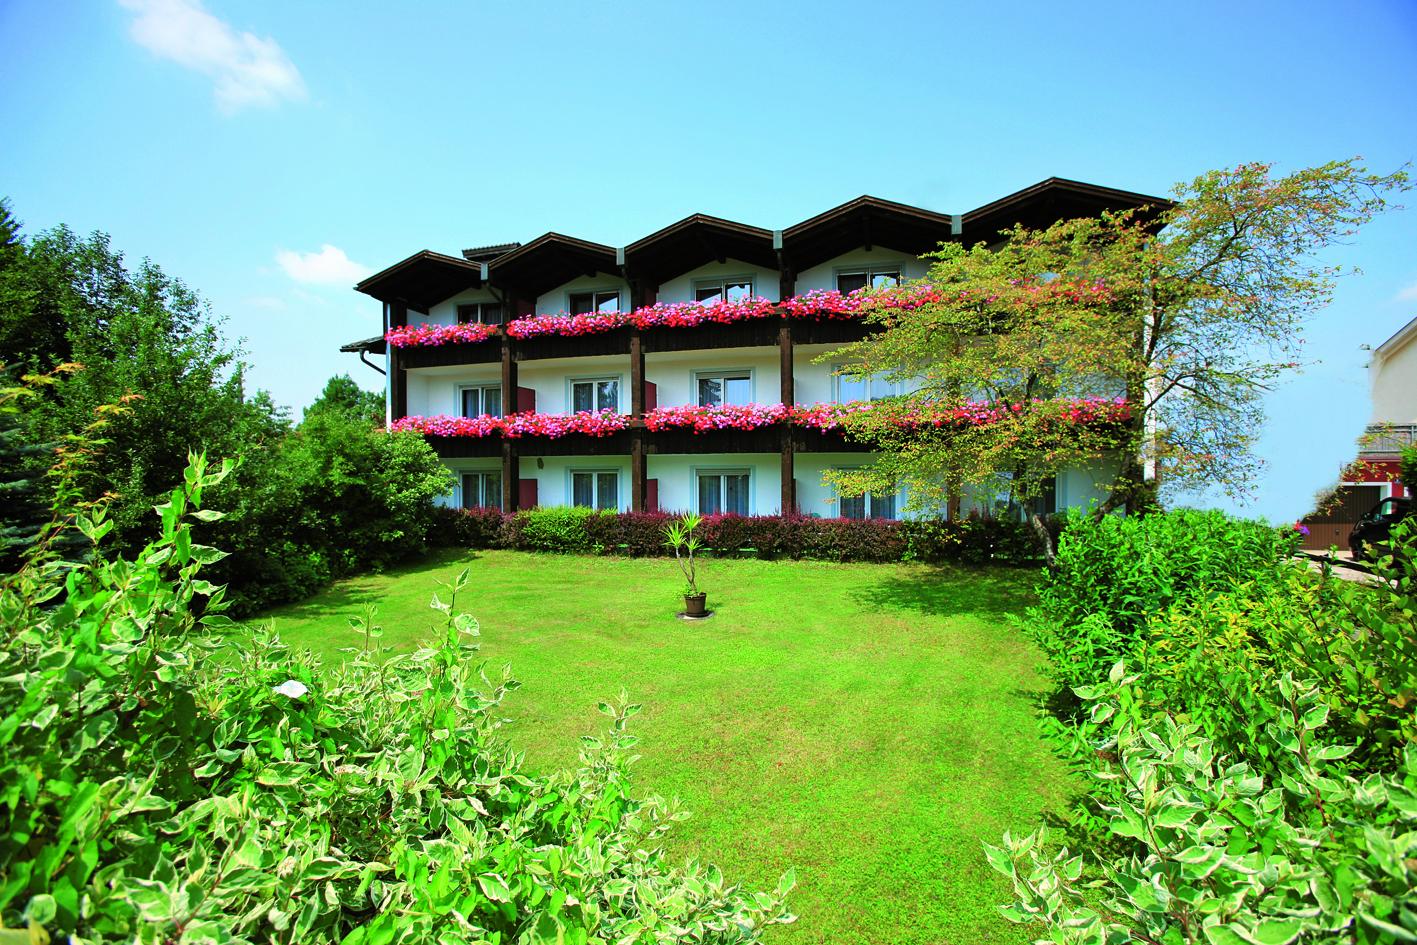 Chiemsee-Chiemgau: Hotel-Pension-Seeblick